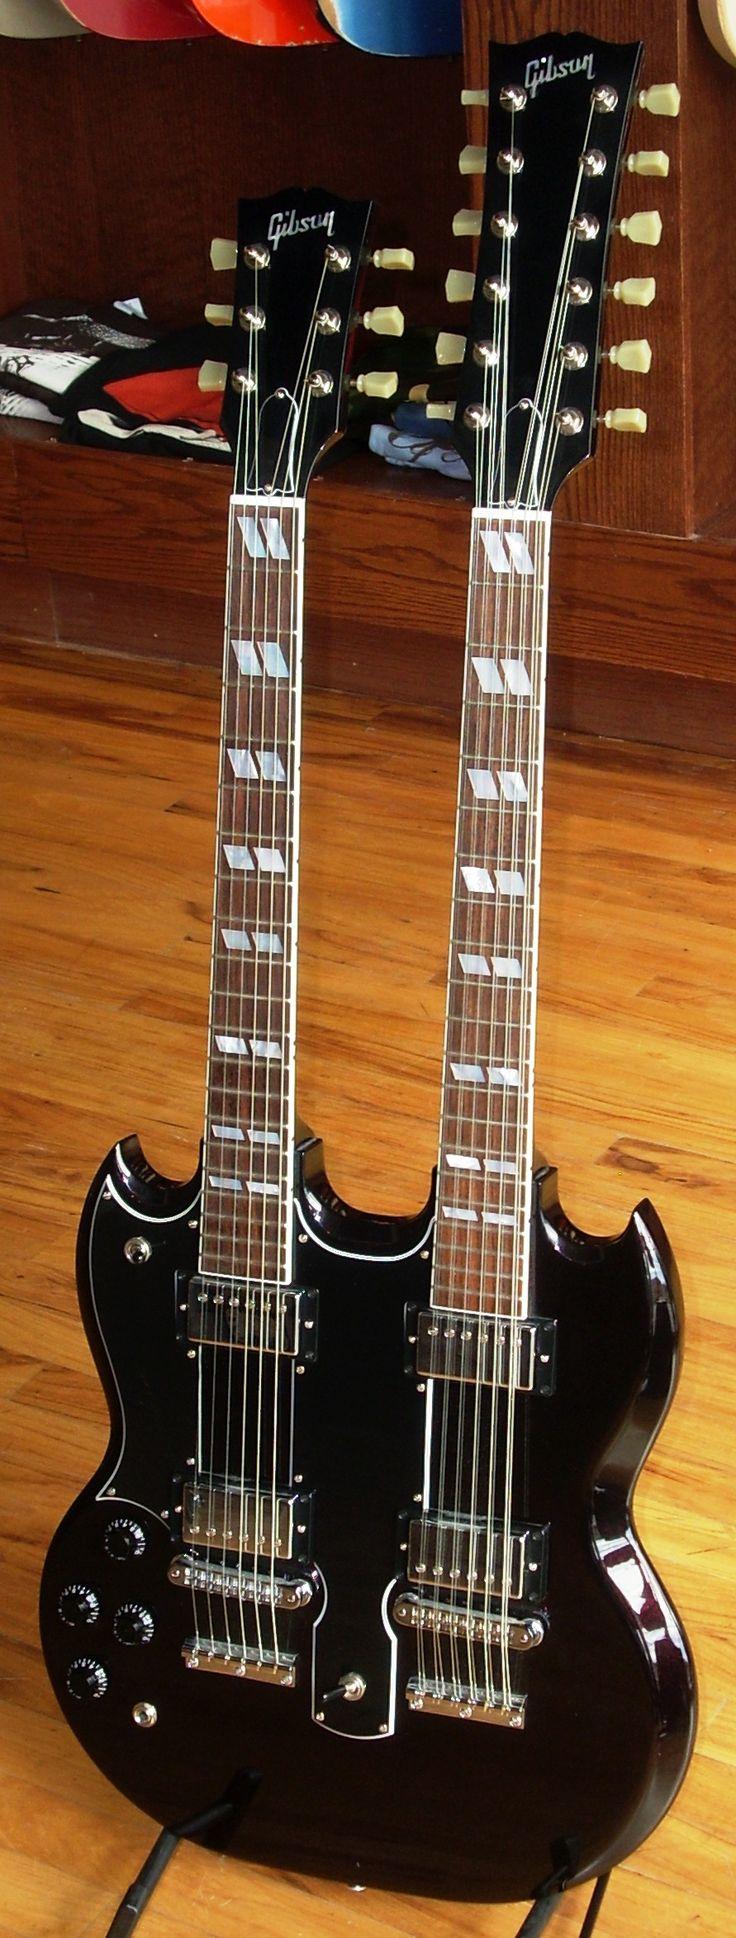 Fender 52 Tele Wiring Diagrams Diagram Master Blogs Brent Mason Telecaster Pickups 3 Pickup